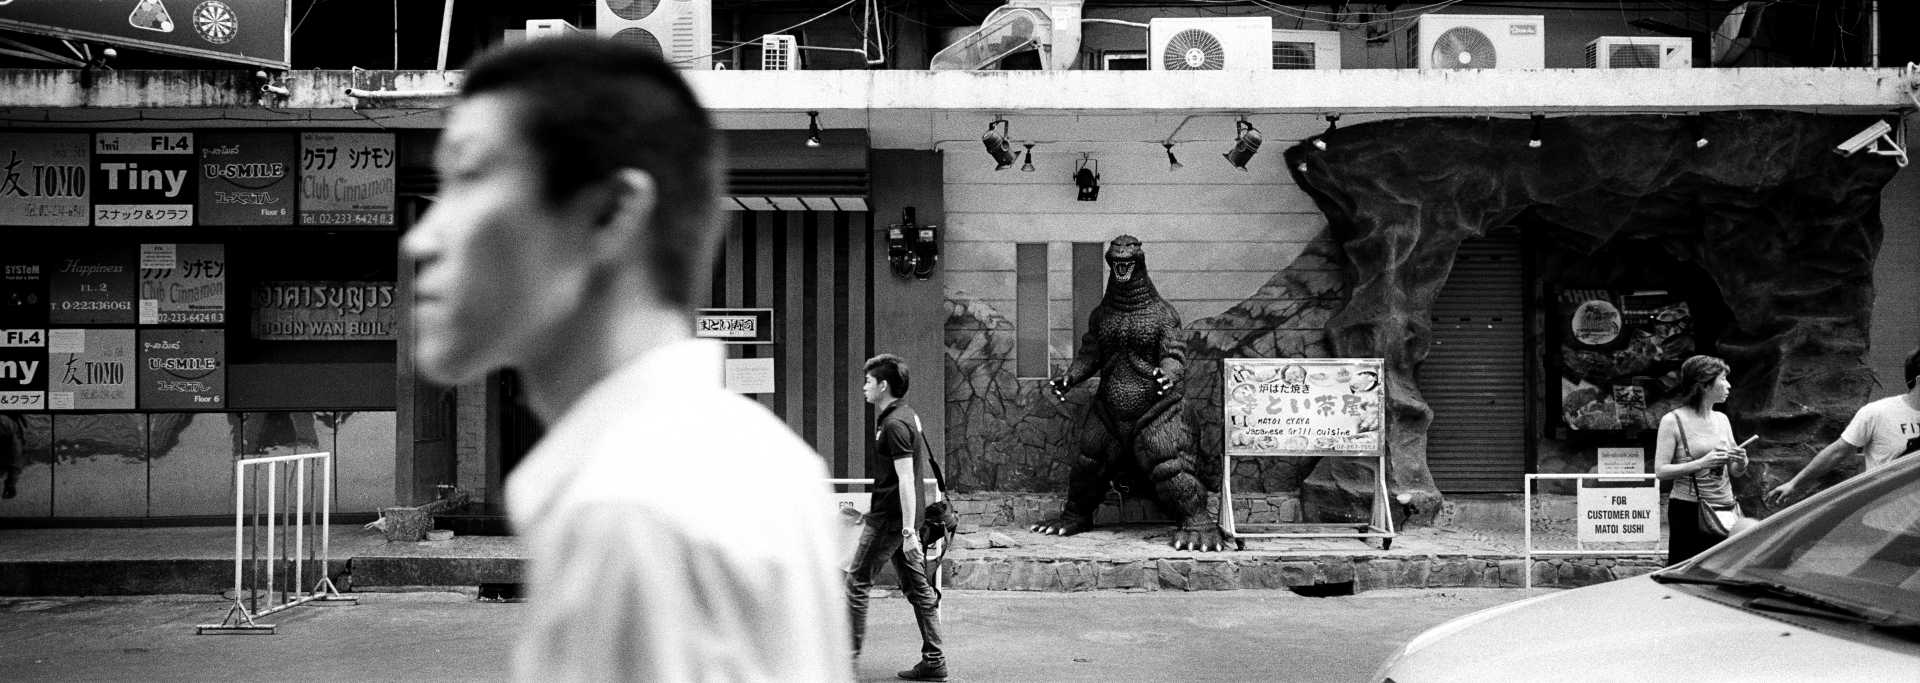 """Godzilla"" Bangkok, Thailand."